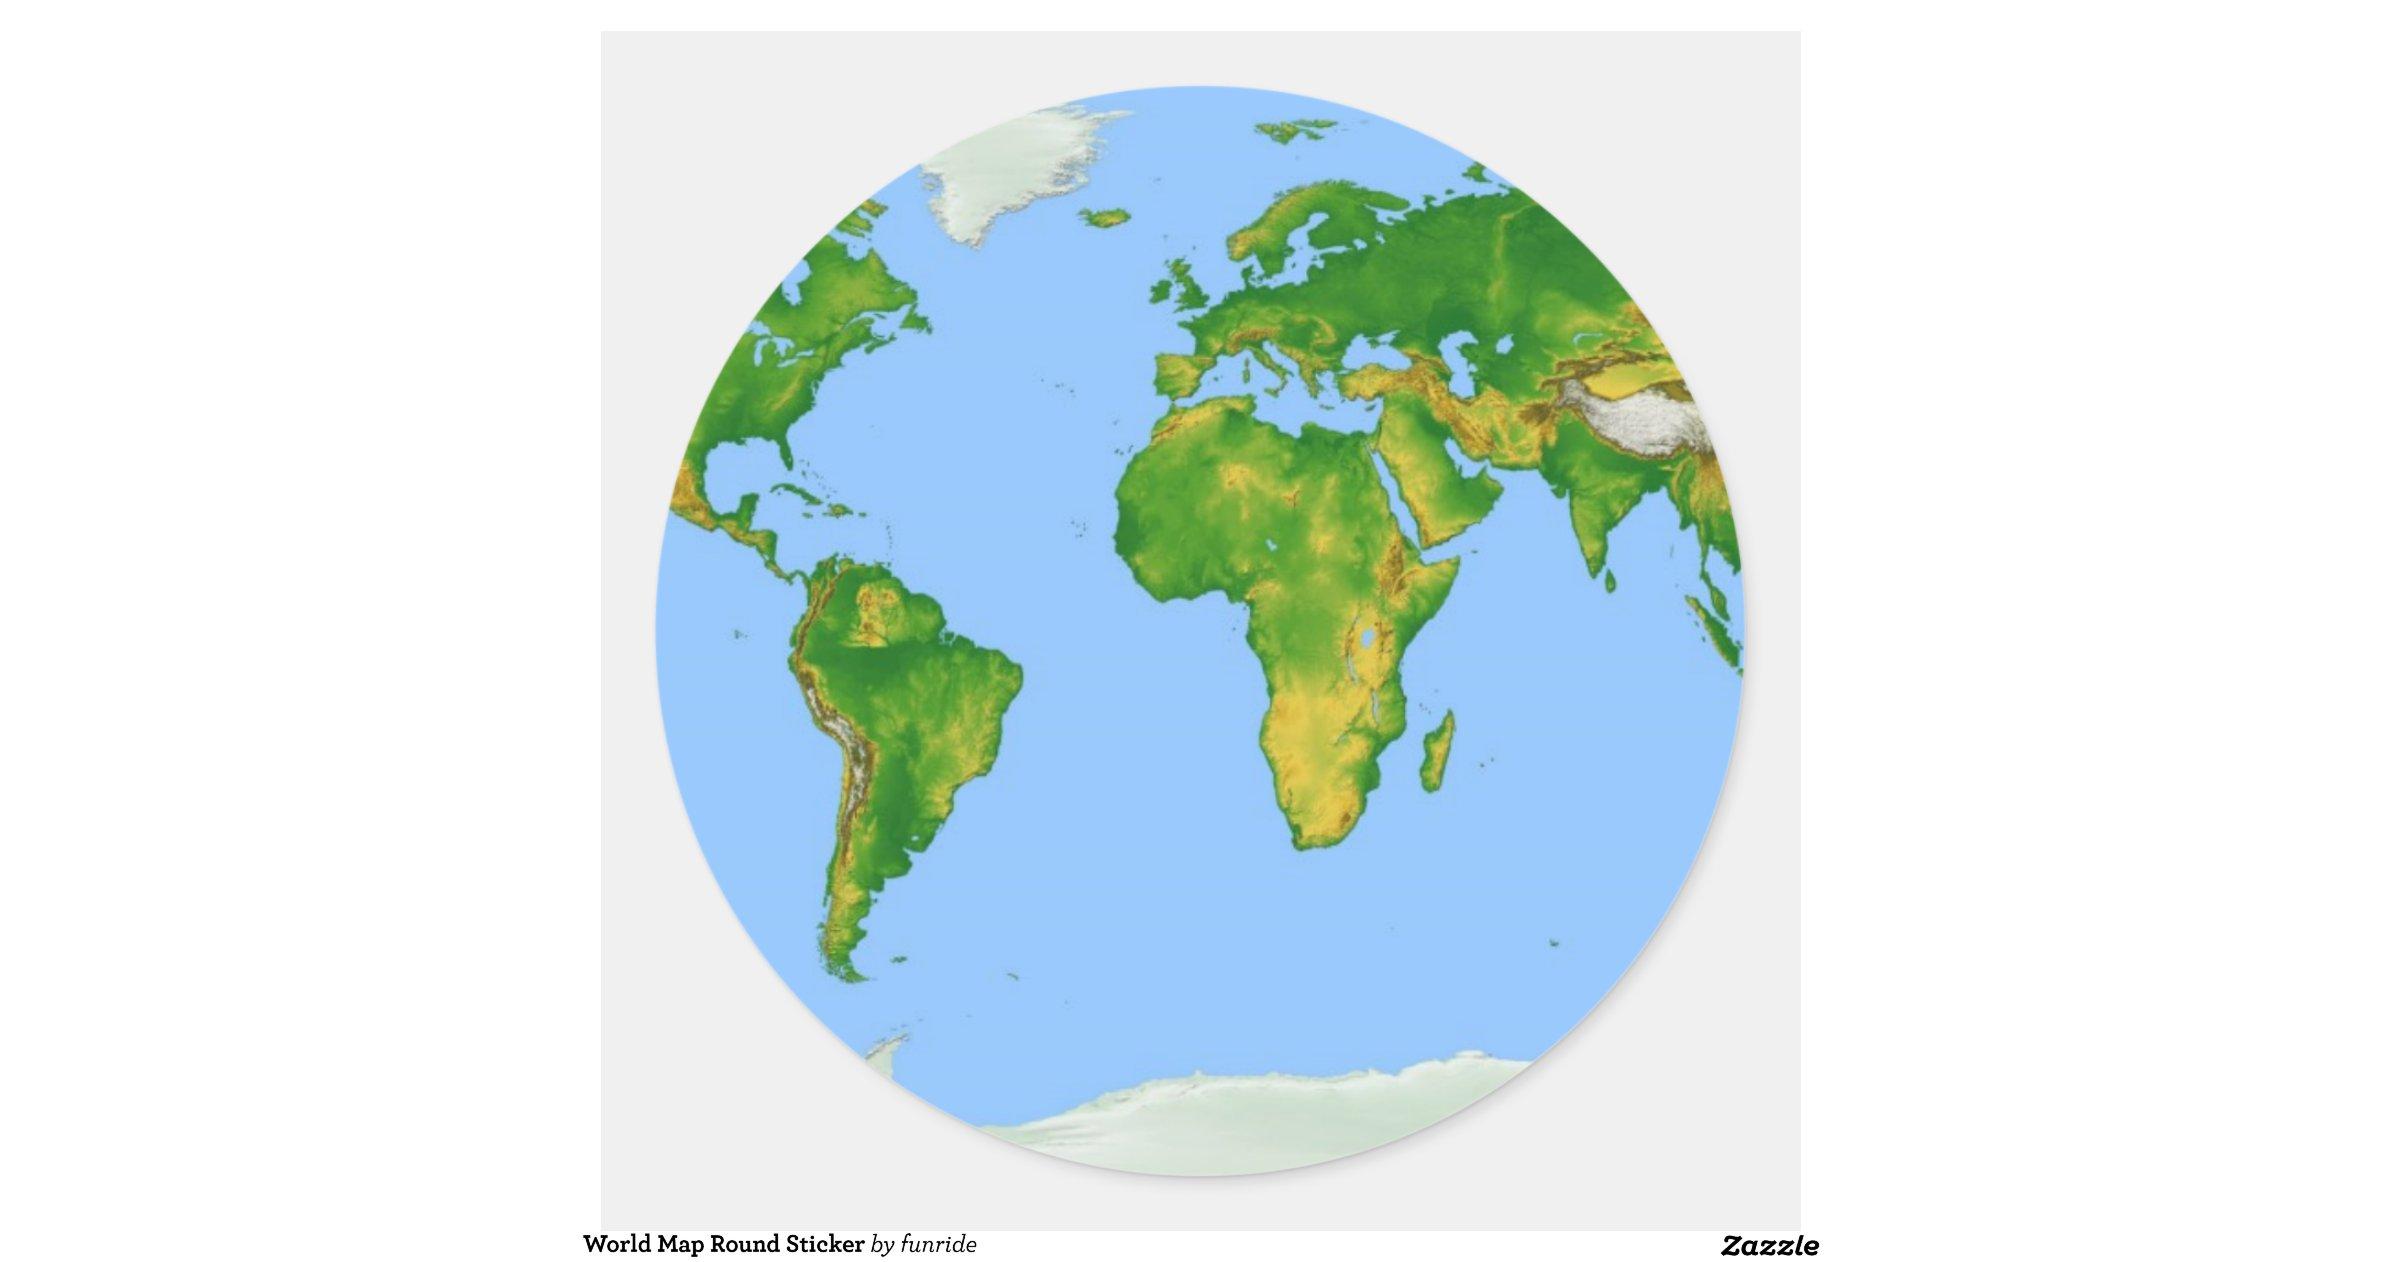 world map round sticker rc96c2b25e1004778ada56a8fa6105ce6. Black Bedroom Furniture Sets. Home Design Ideas